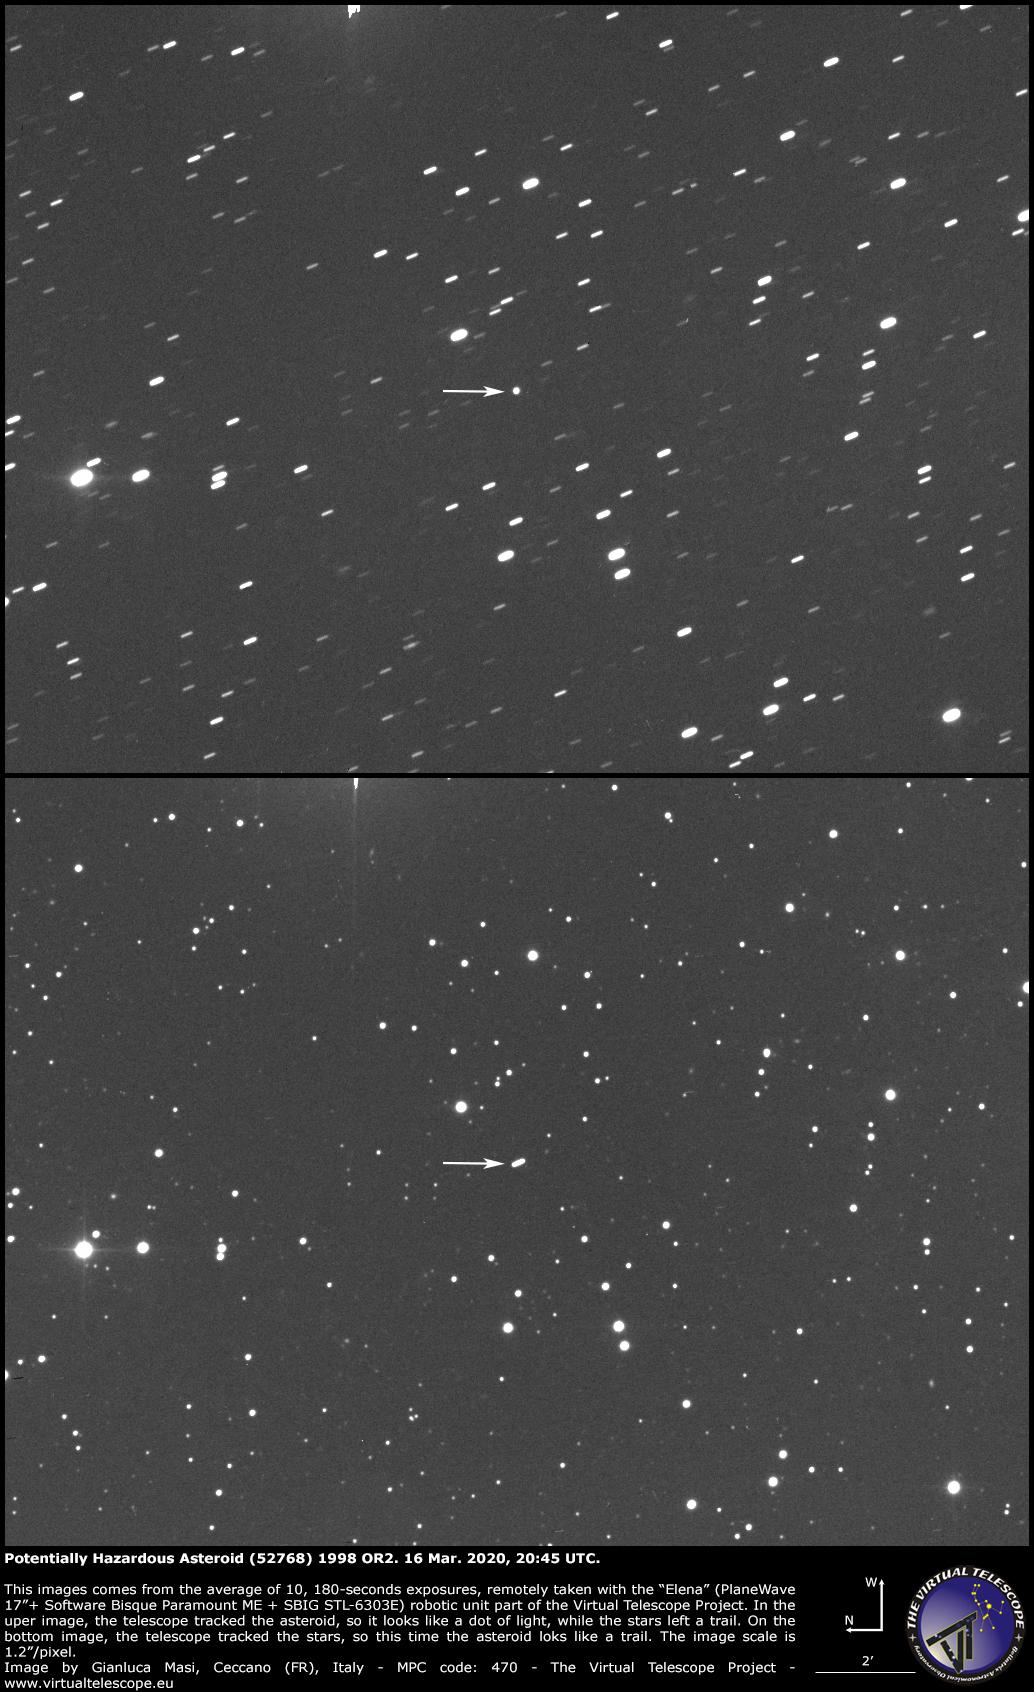 Potentially Hazardous Asteroid (52768) 1998 OR2: a image - 16 Mar. 2020